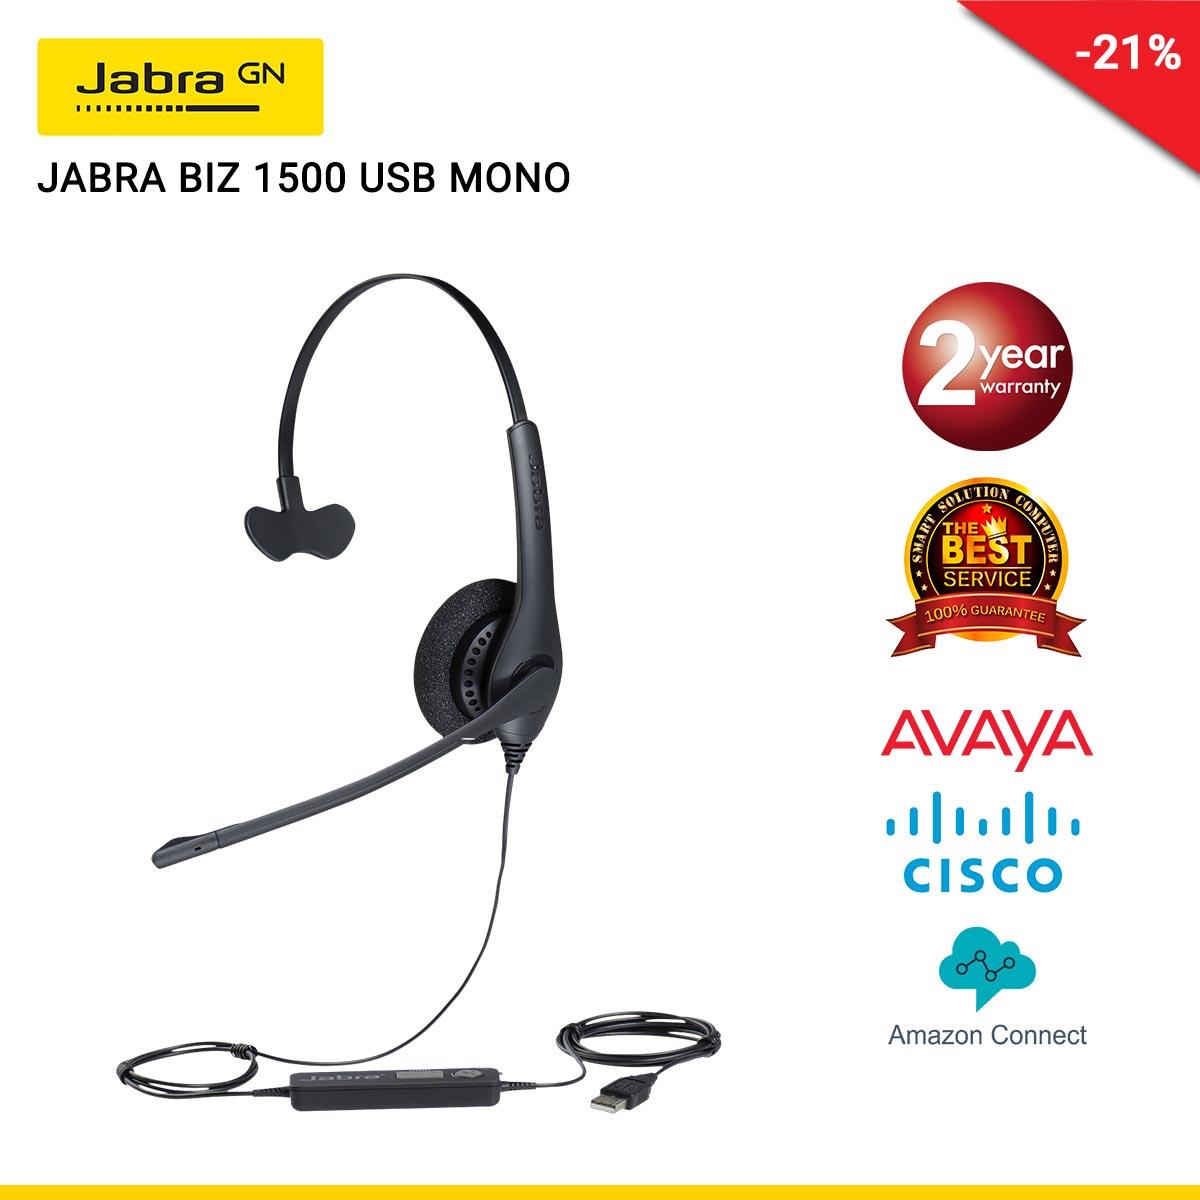 JABRA BIZ 1500 USB MONO (JBA-1553-0159)